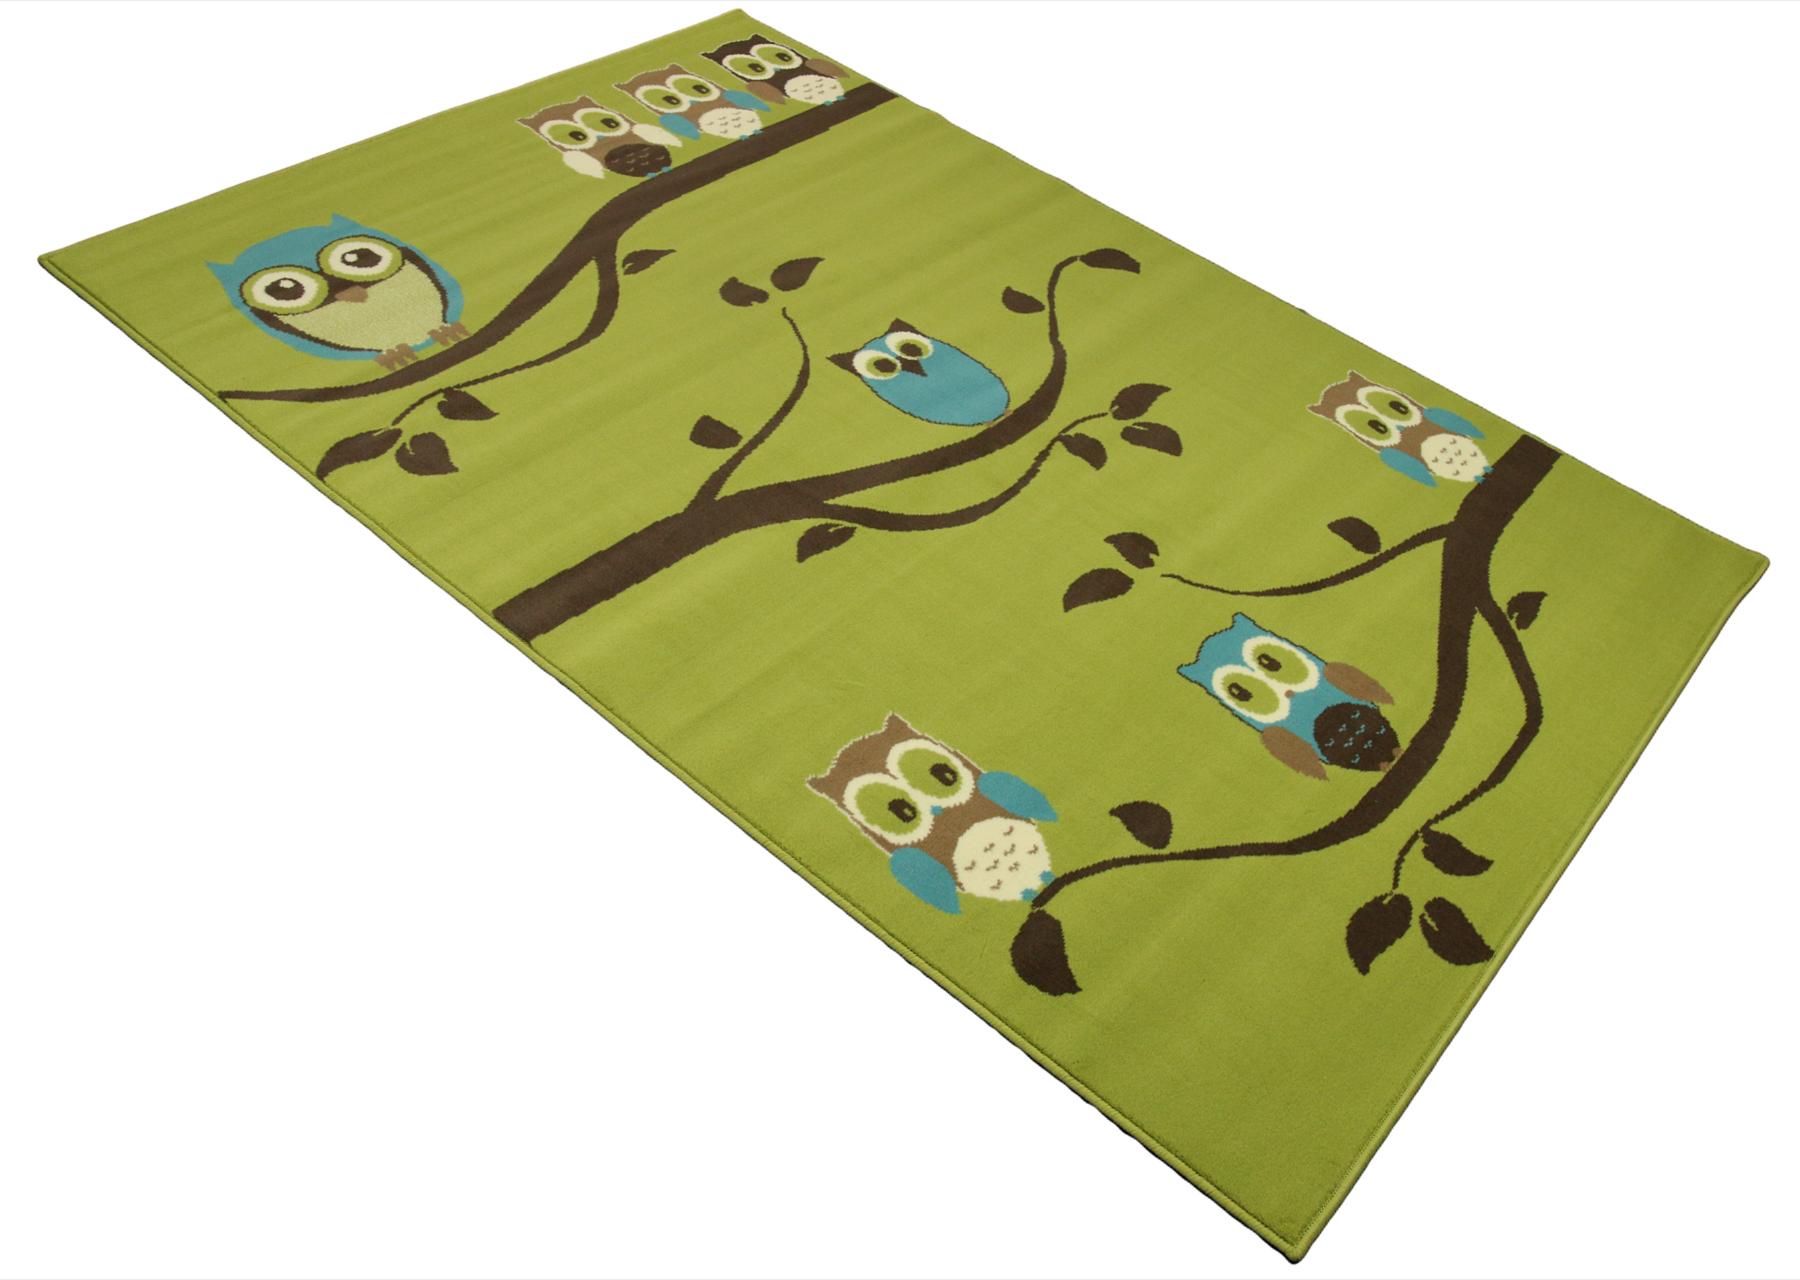 universol tapis de jeu enfant ville bord de mer bleu cat gorie tapi. Black Bedroom Furniture Sets. Home Design Ideas